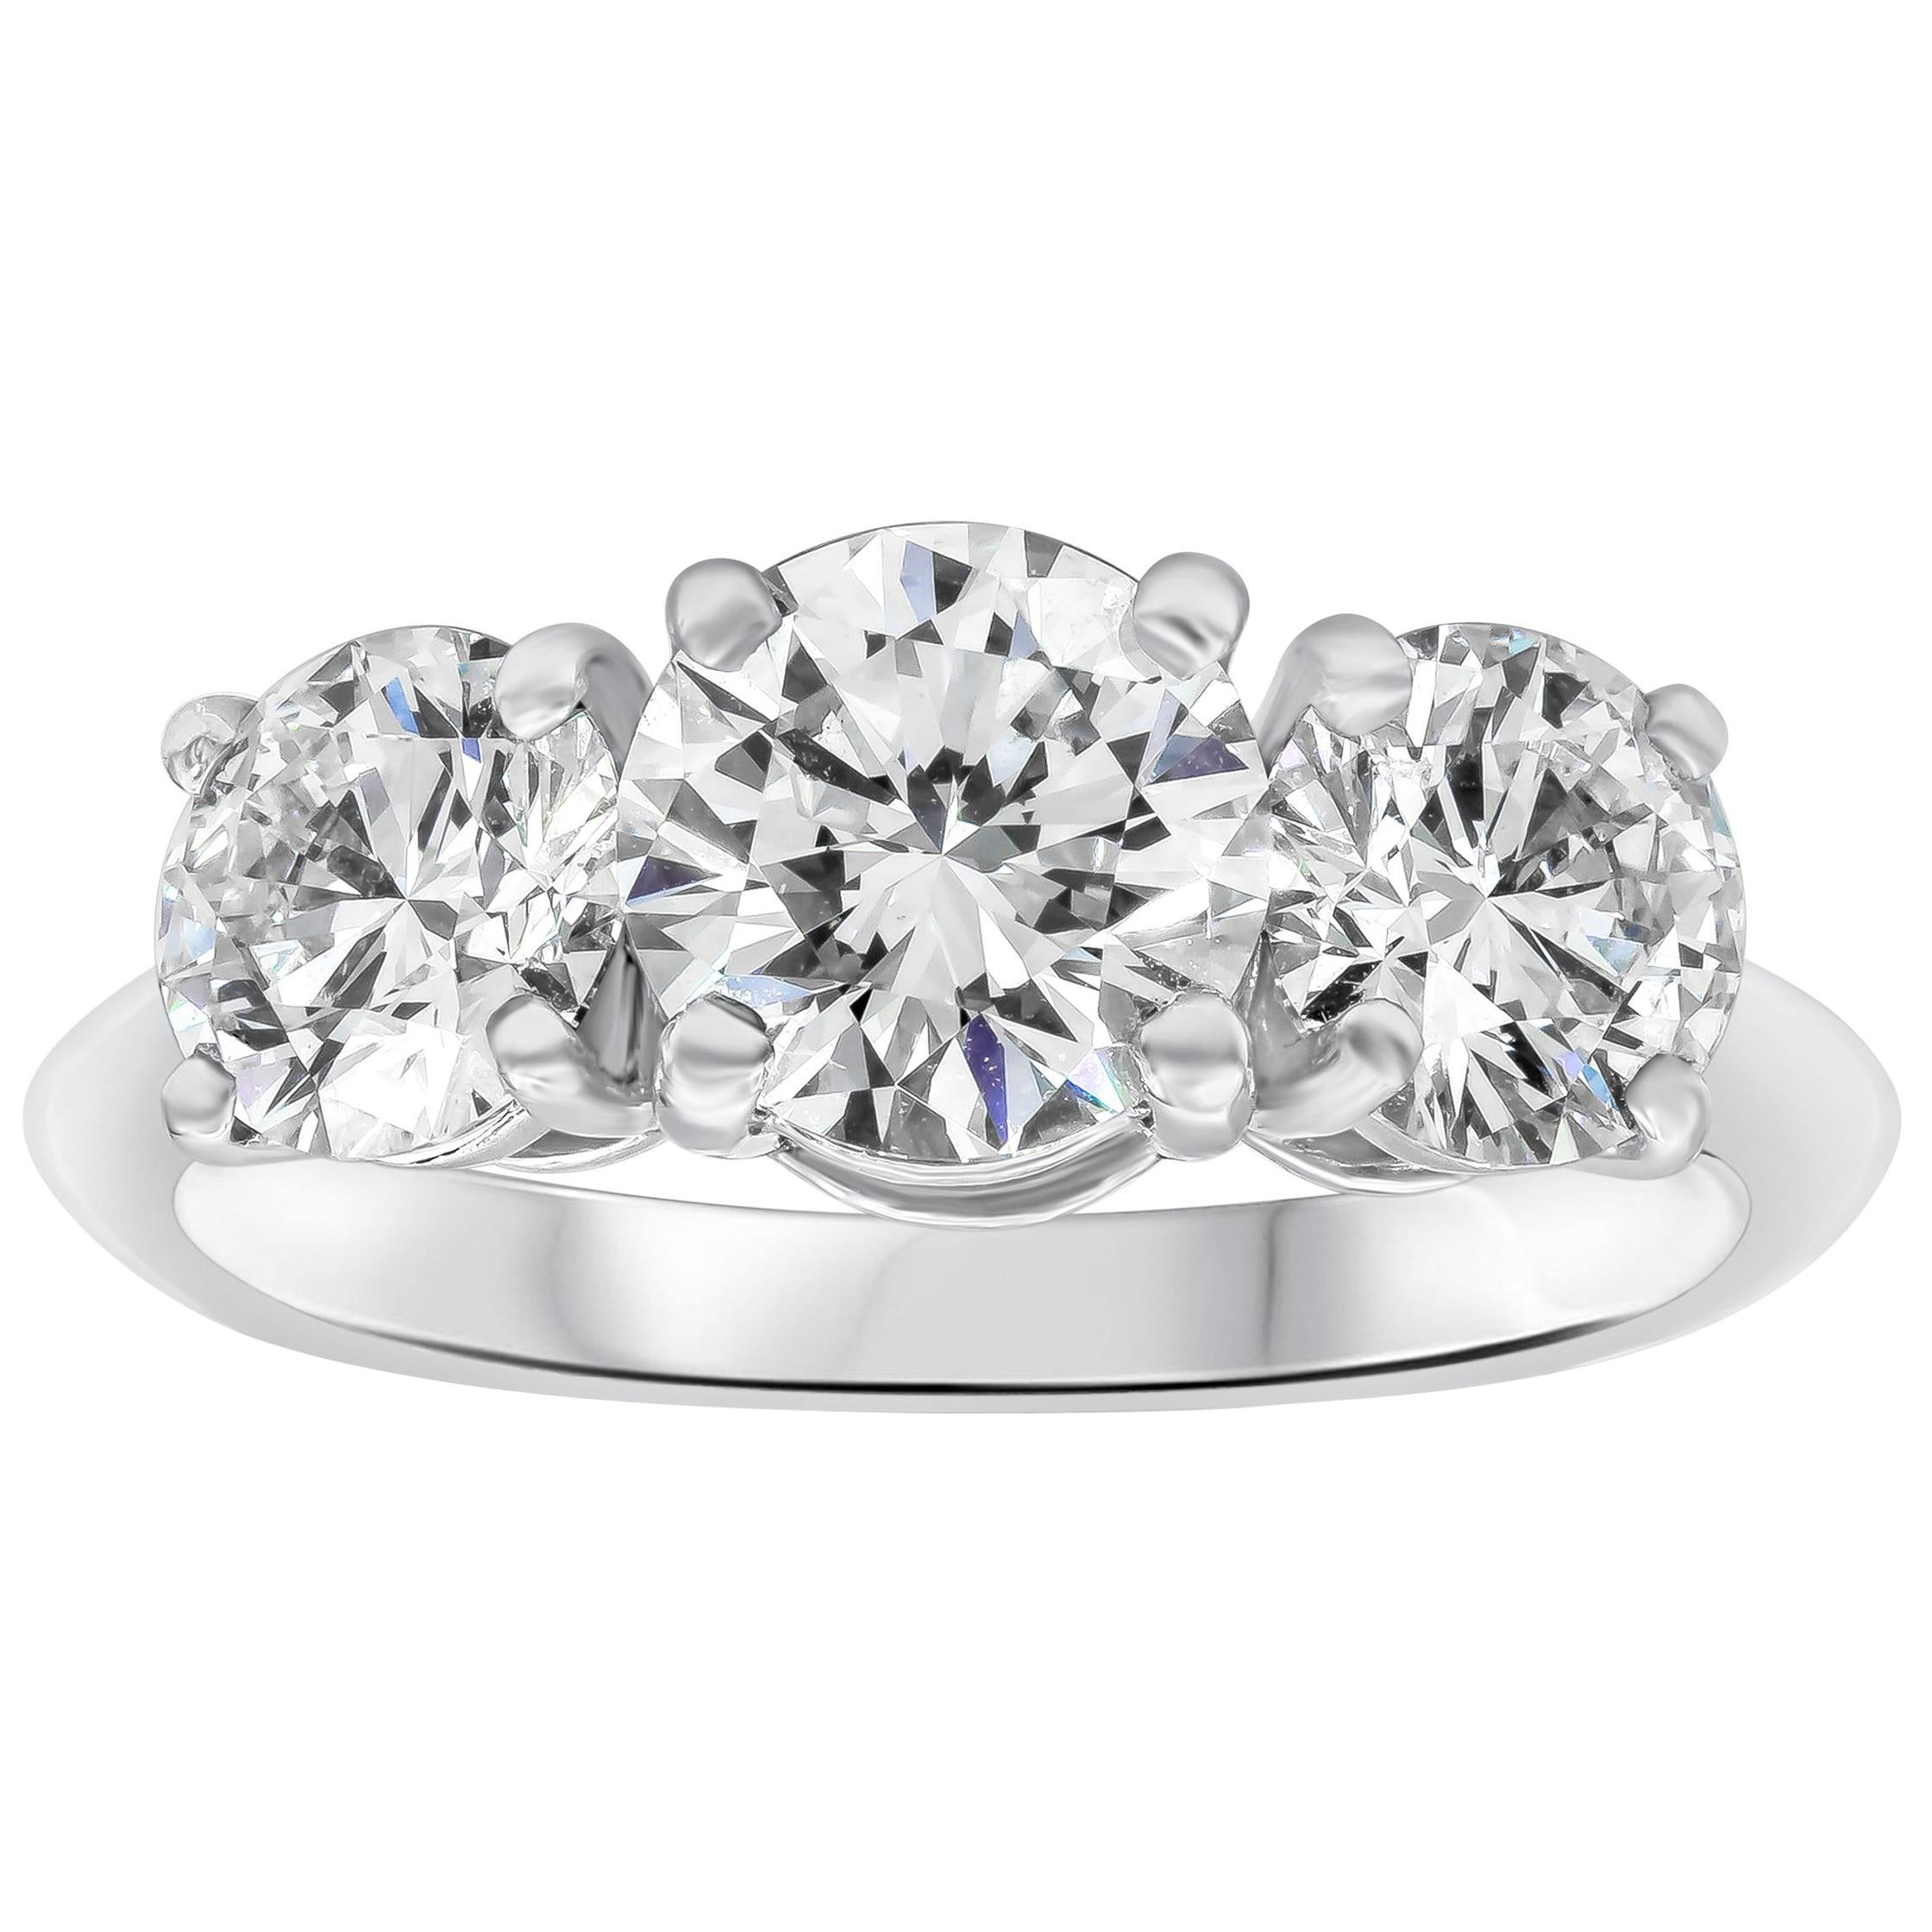 Tiffany & Co. Three-Stone Diamond GIA Certified Platinum Engagement Ring